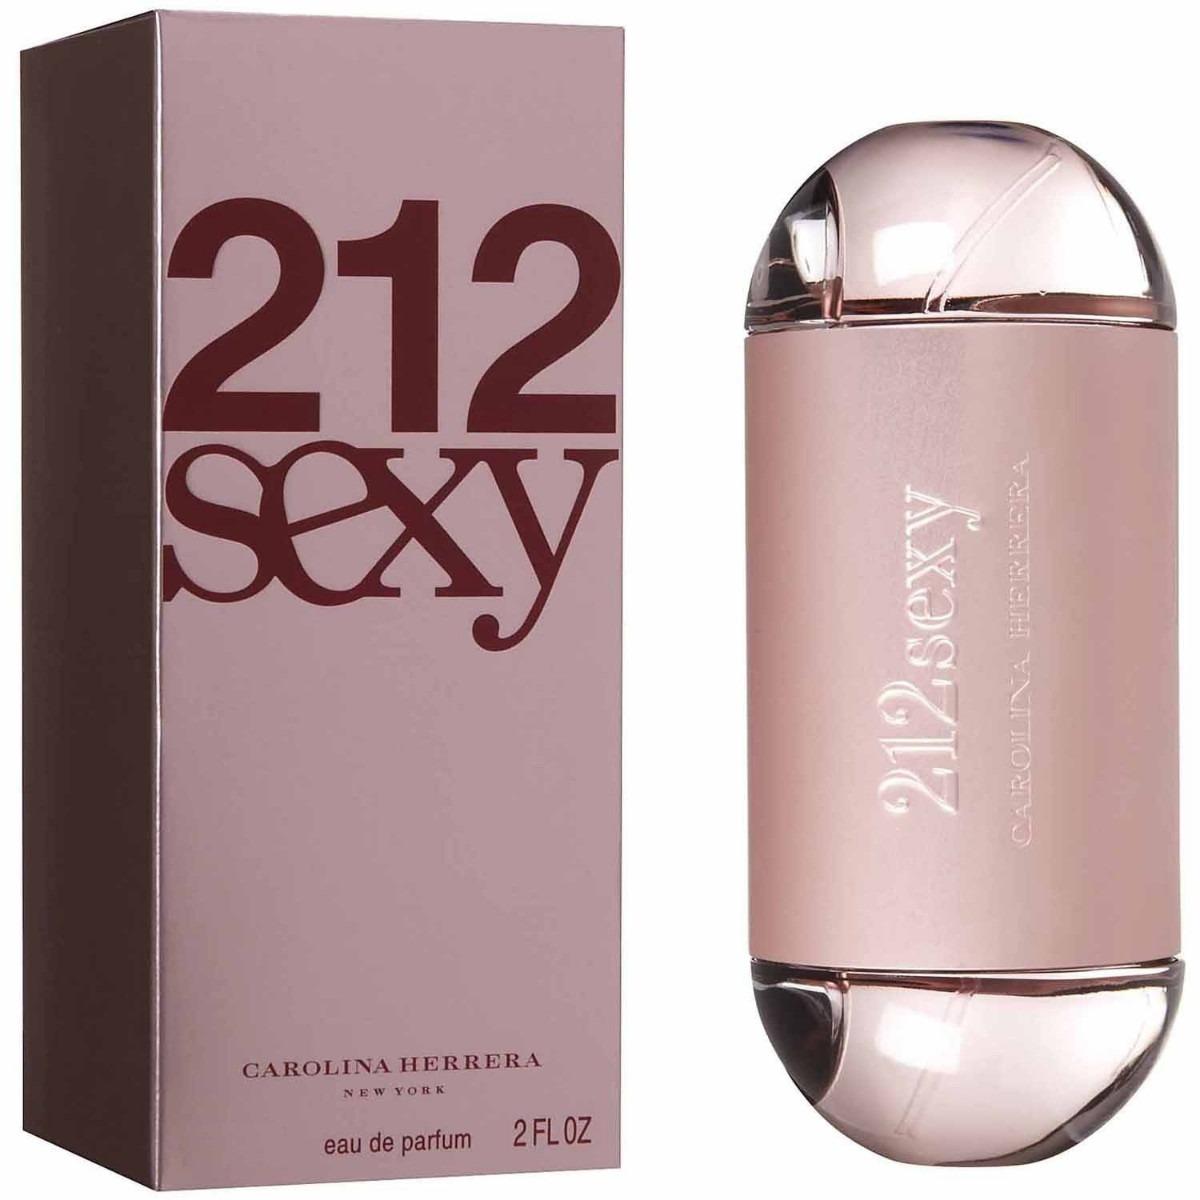 57c24df5f Características. Marca Carolina Herrera  Nome do perfume 212 Sexy  Gênero  Feminino  Tipo Eau de parfum  Volume da unidade 60 mL ...